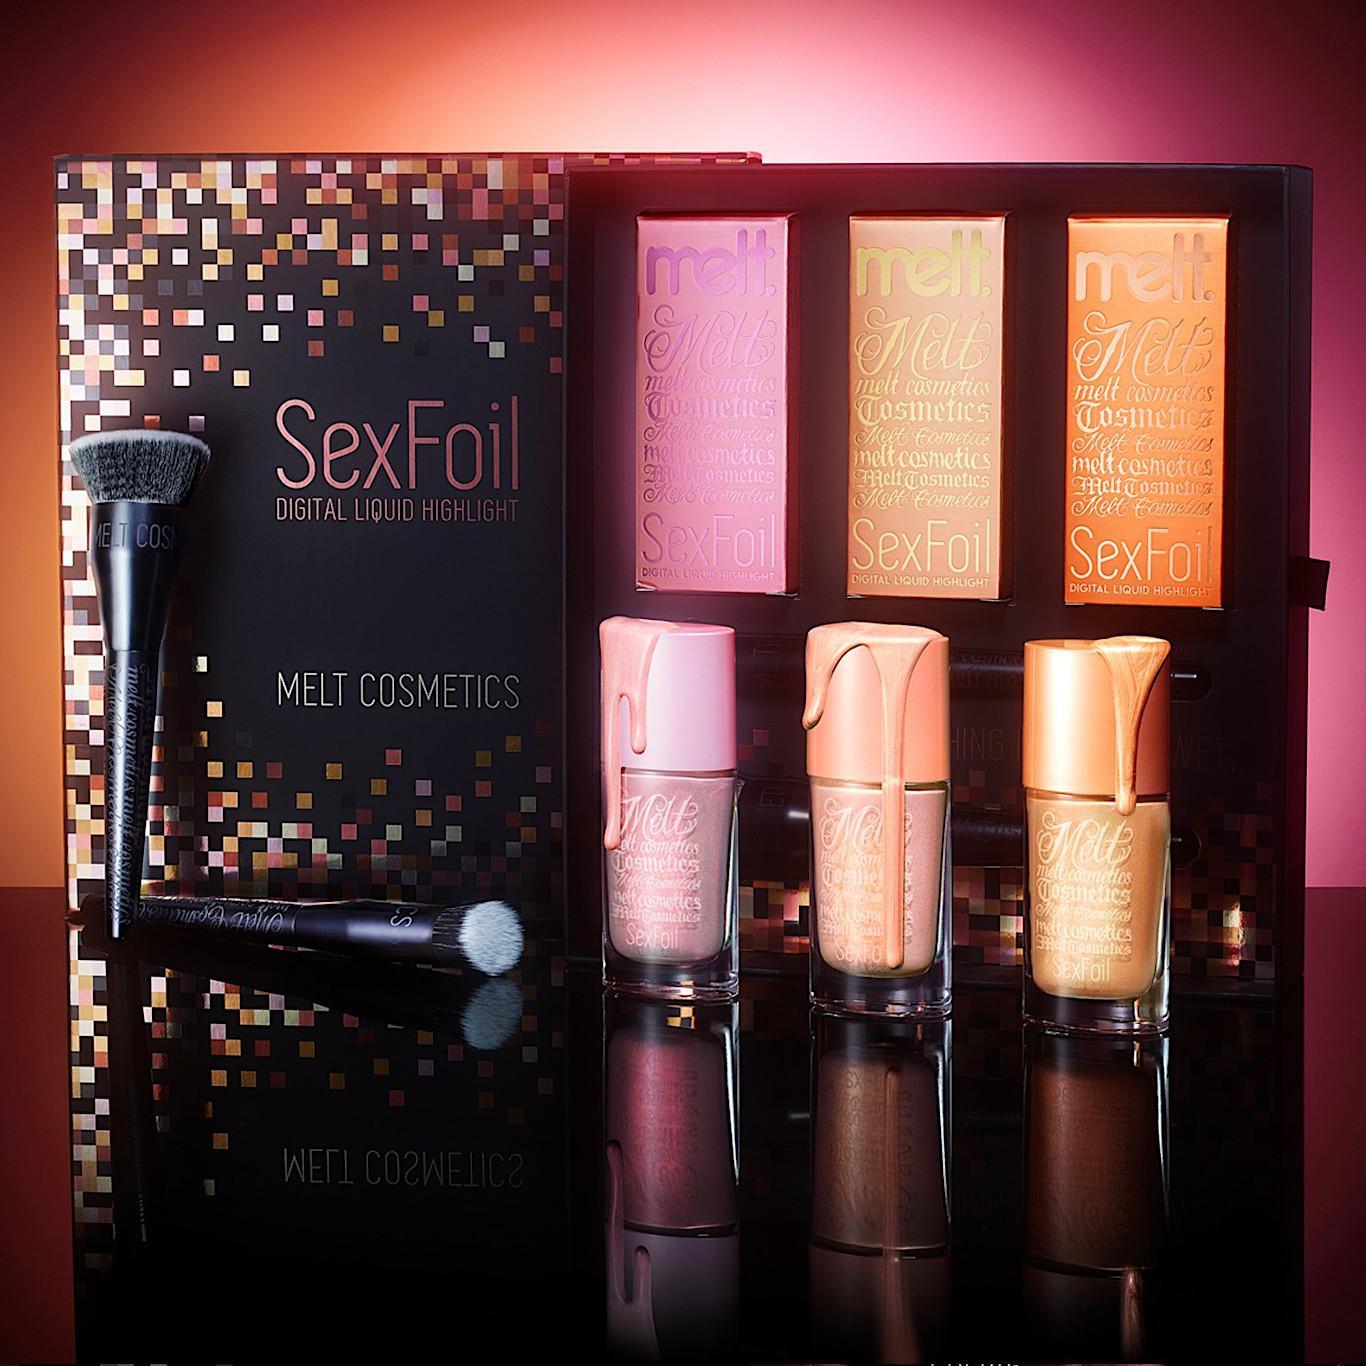 Melt Cosmetics SexFoil Digital Liquid Highlights Light SexFoils Set Promo